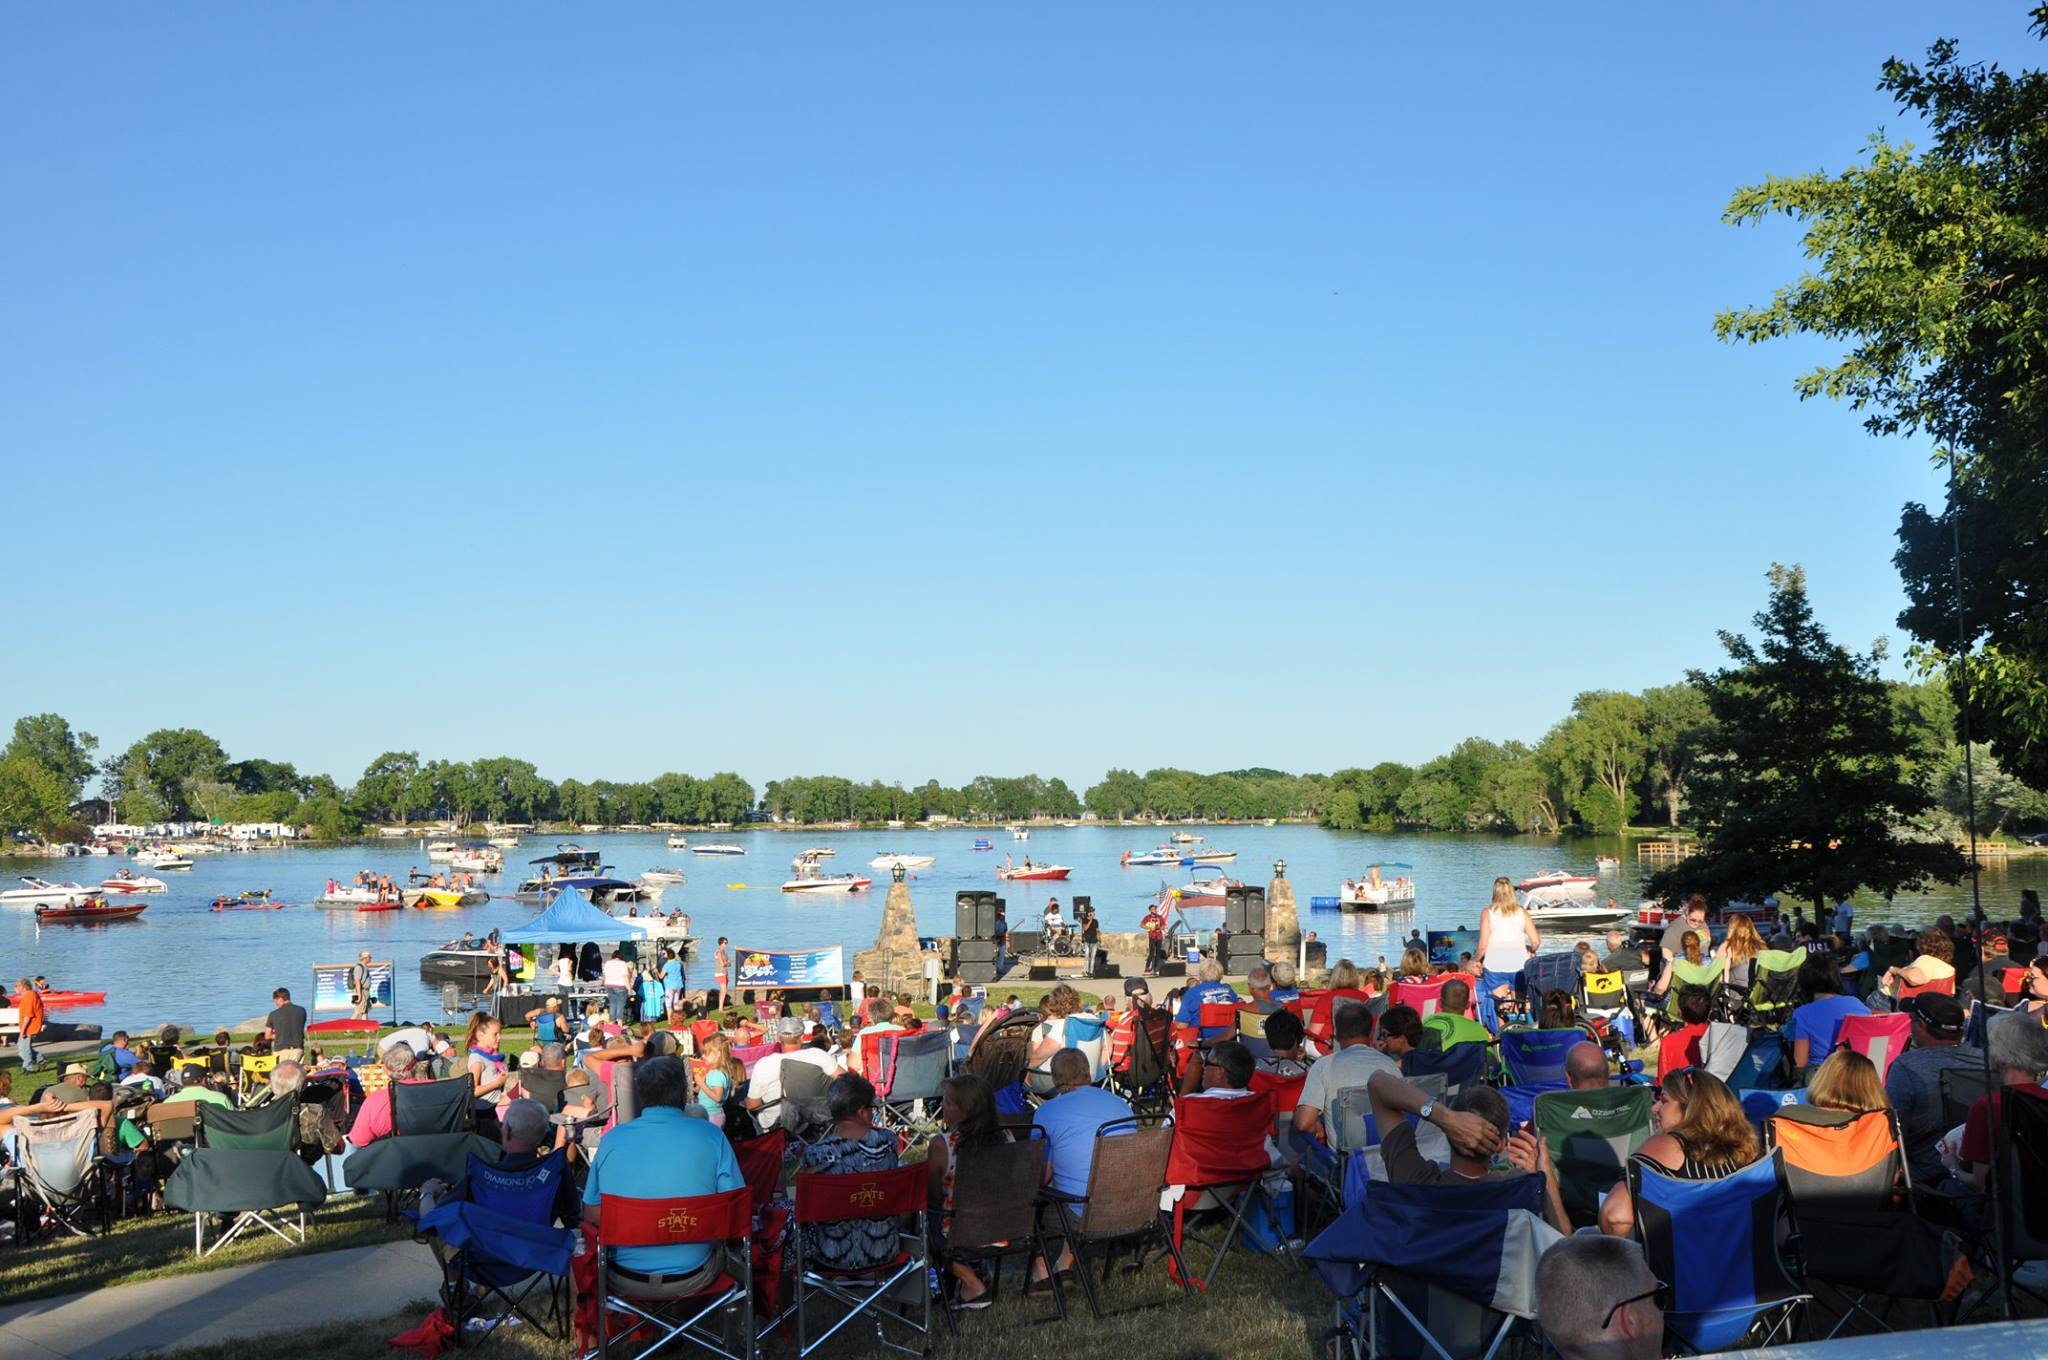 Lake View Iowa Water Carnival 2018 b2wins